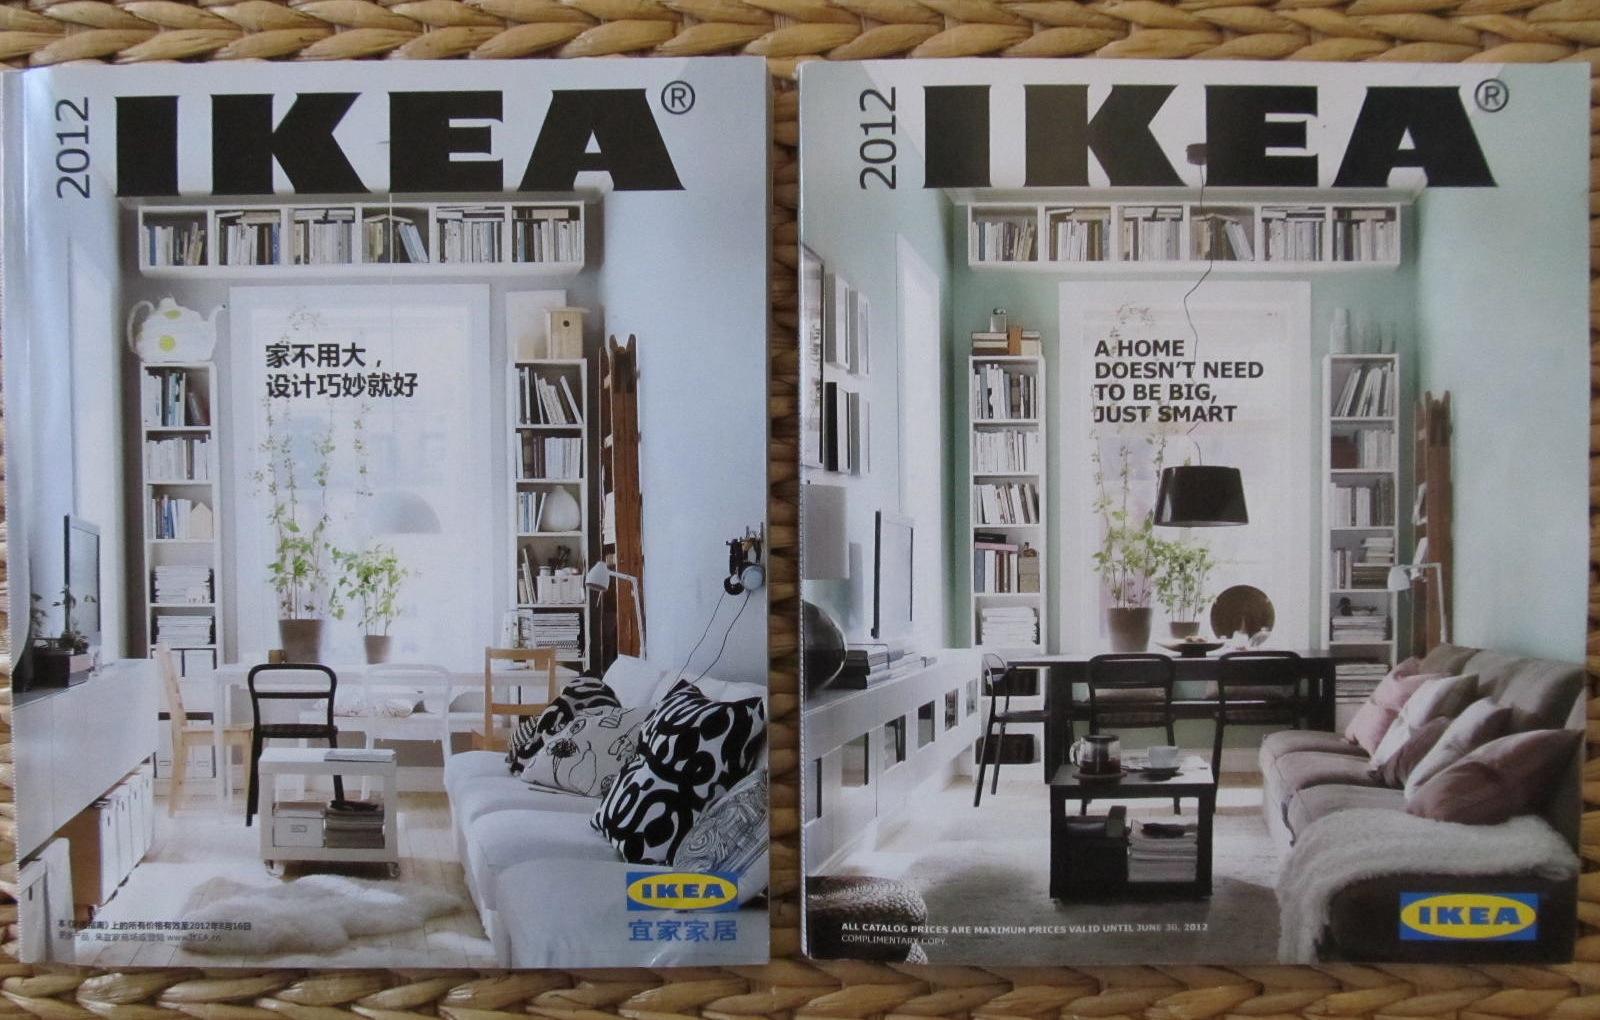 2011 Ikea Catalog knesting ikea inspiration: november 2011